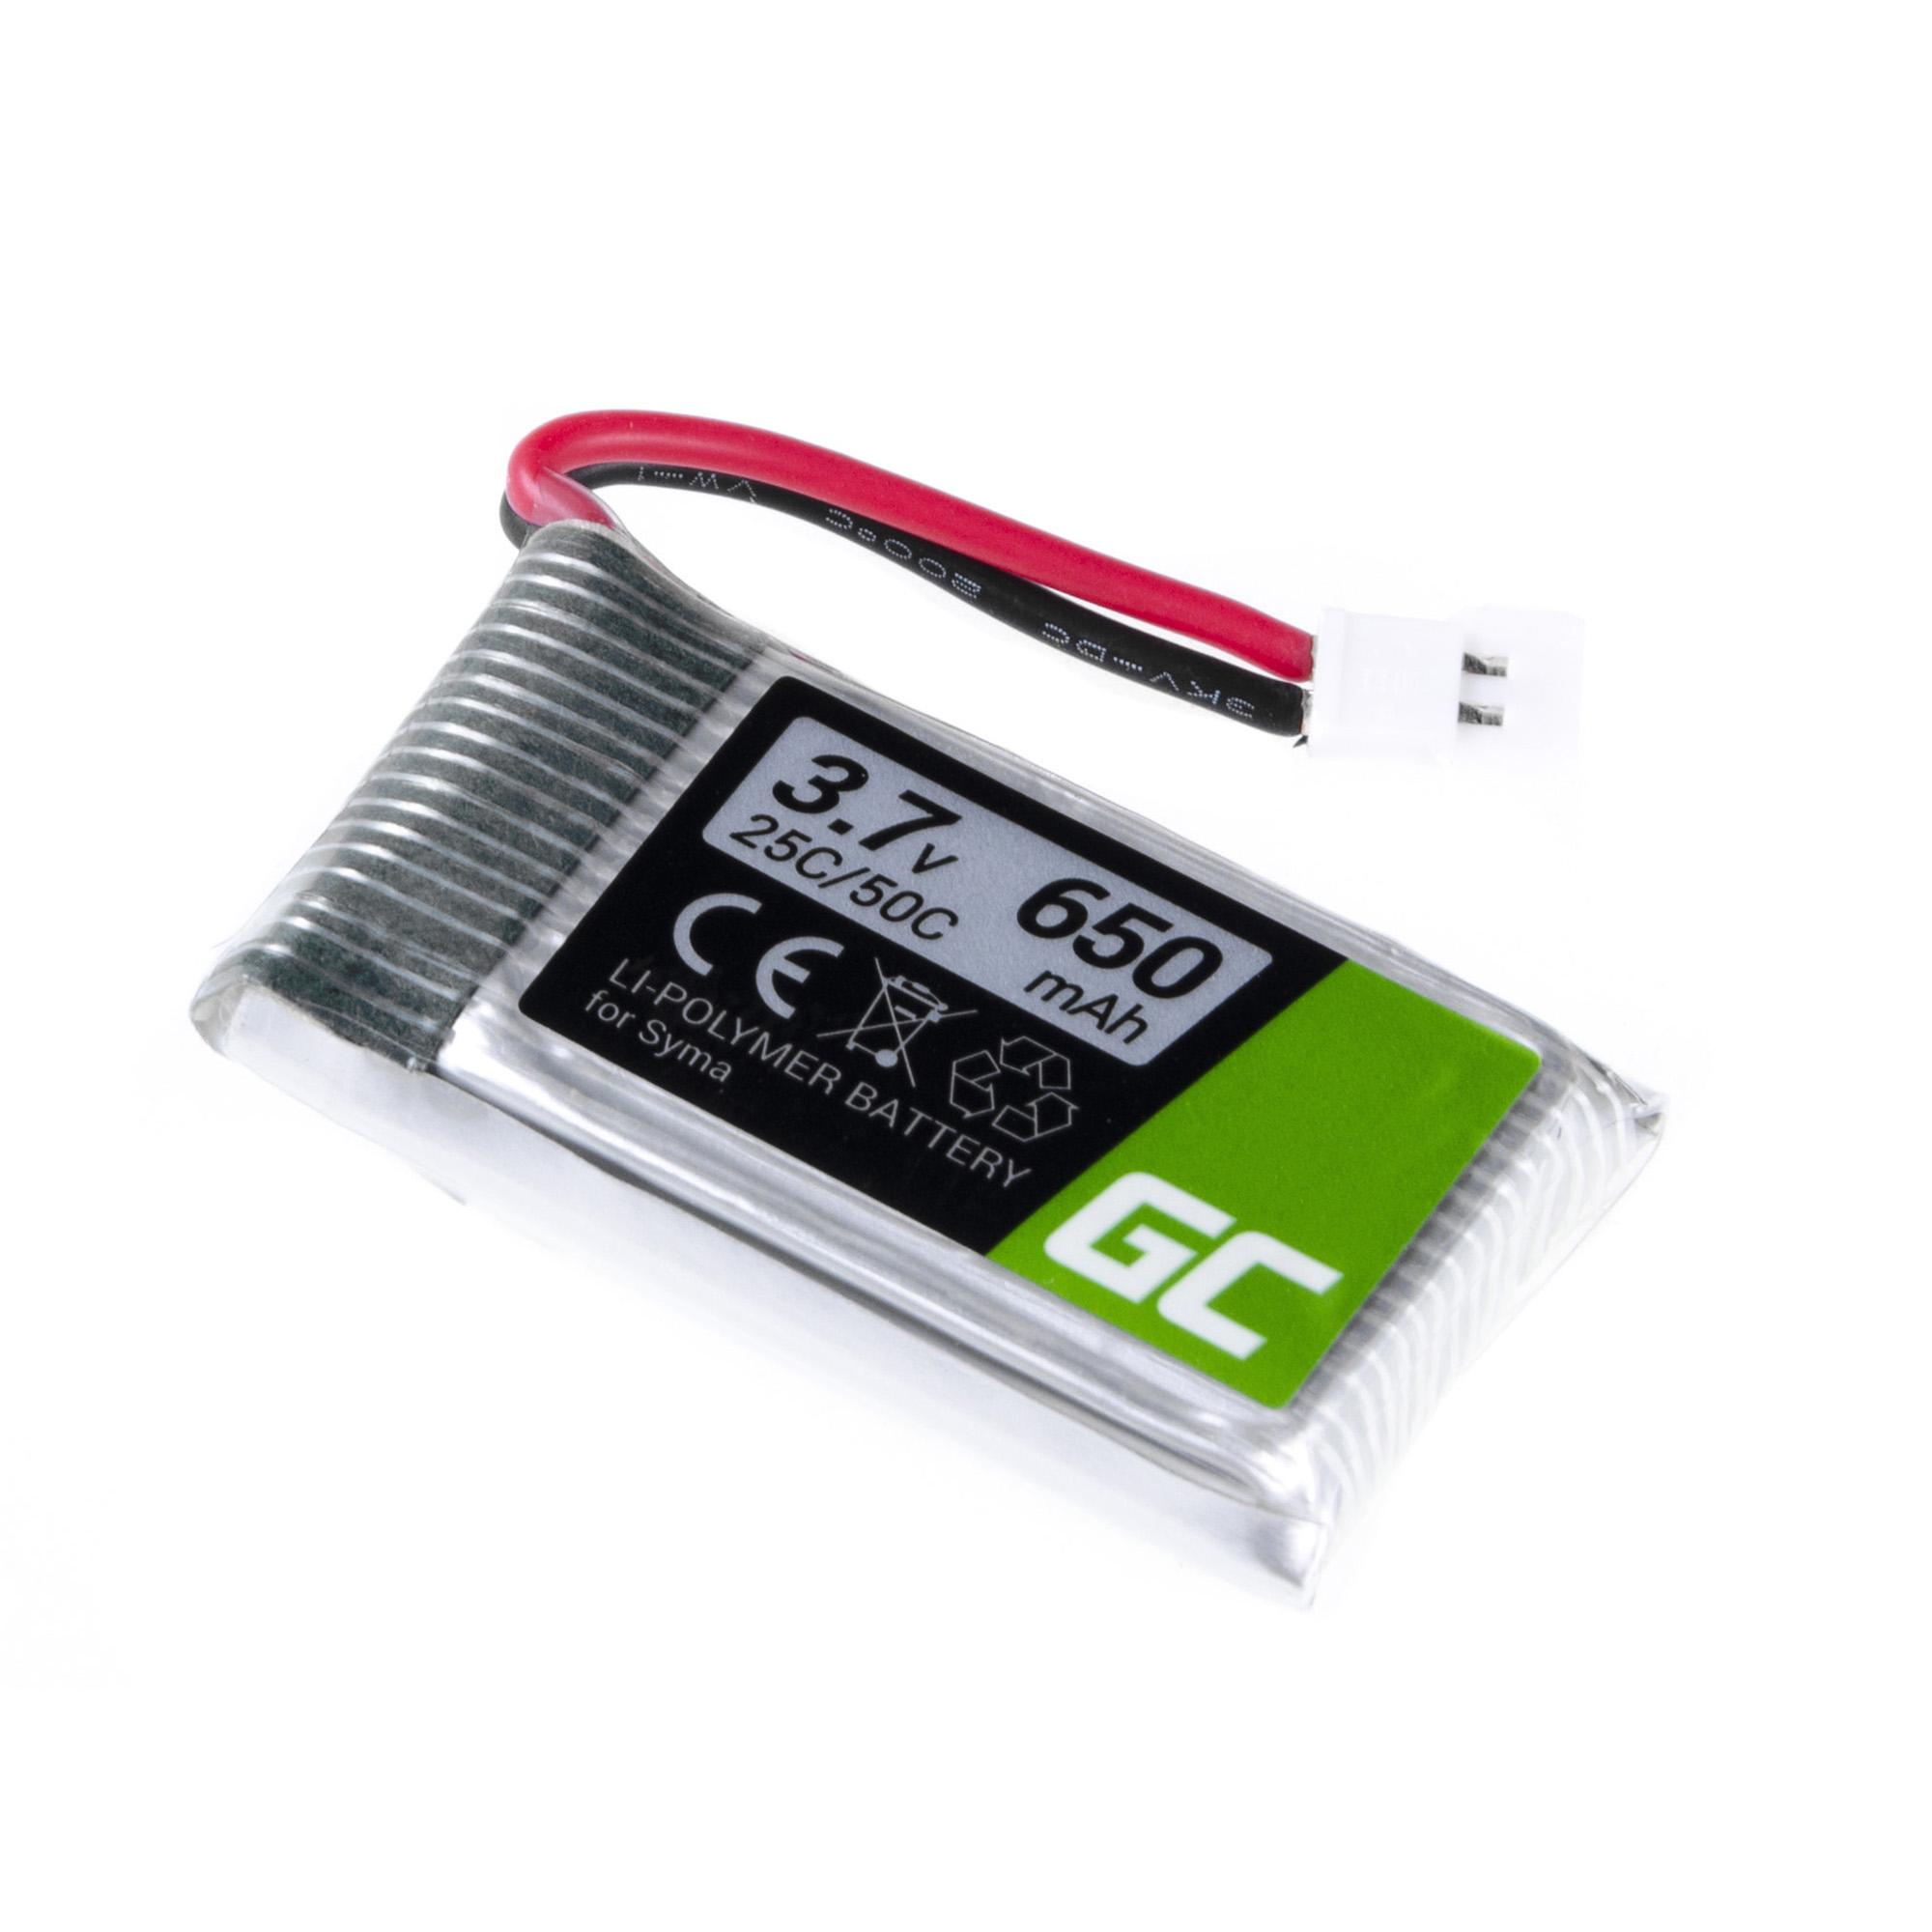 1.1Ah Drone Battery for Syma X5SC X5SW